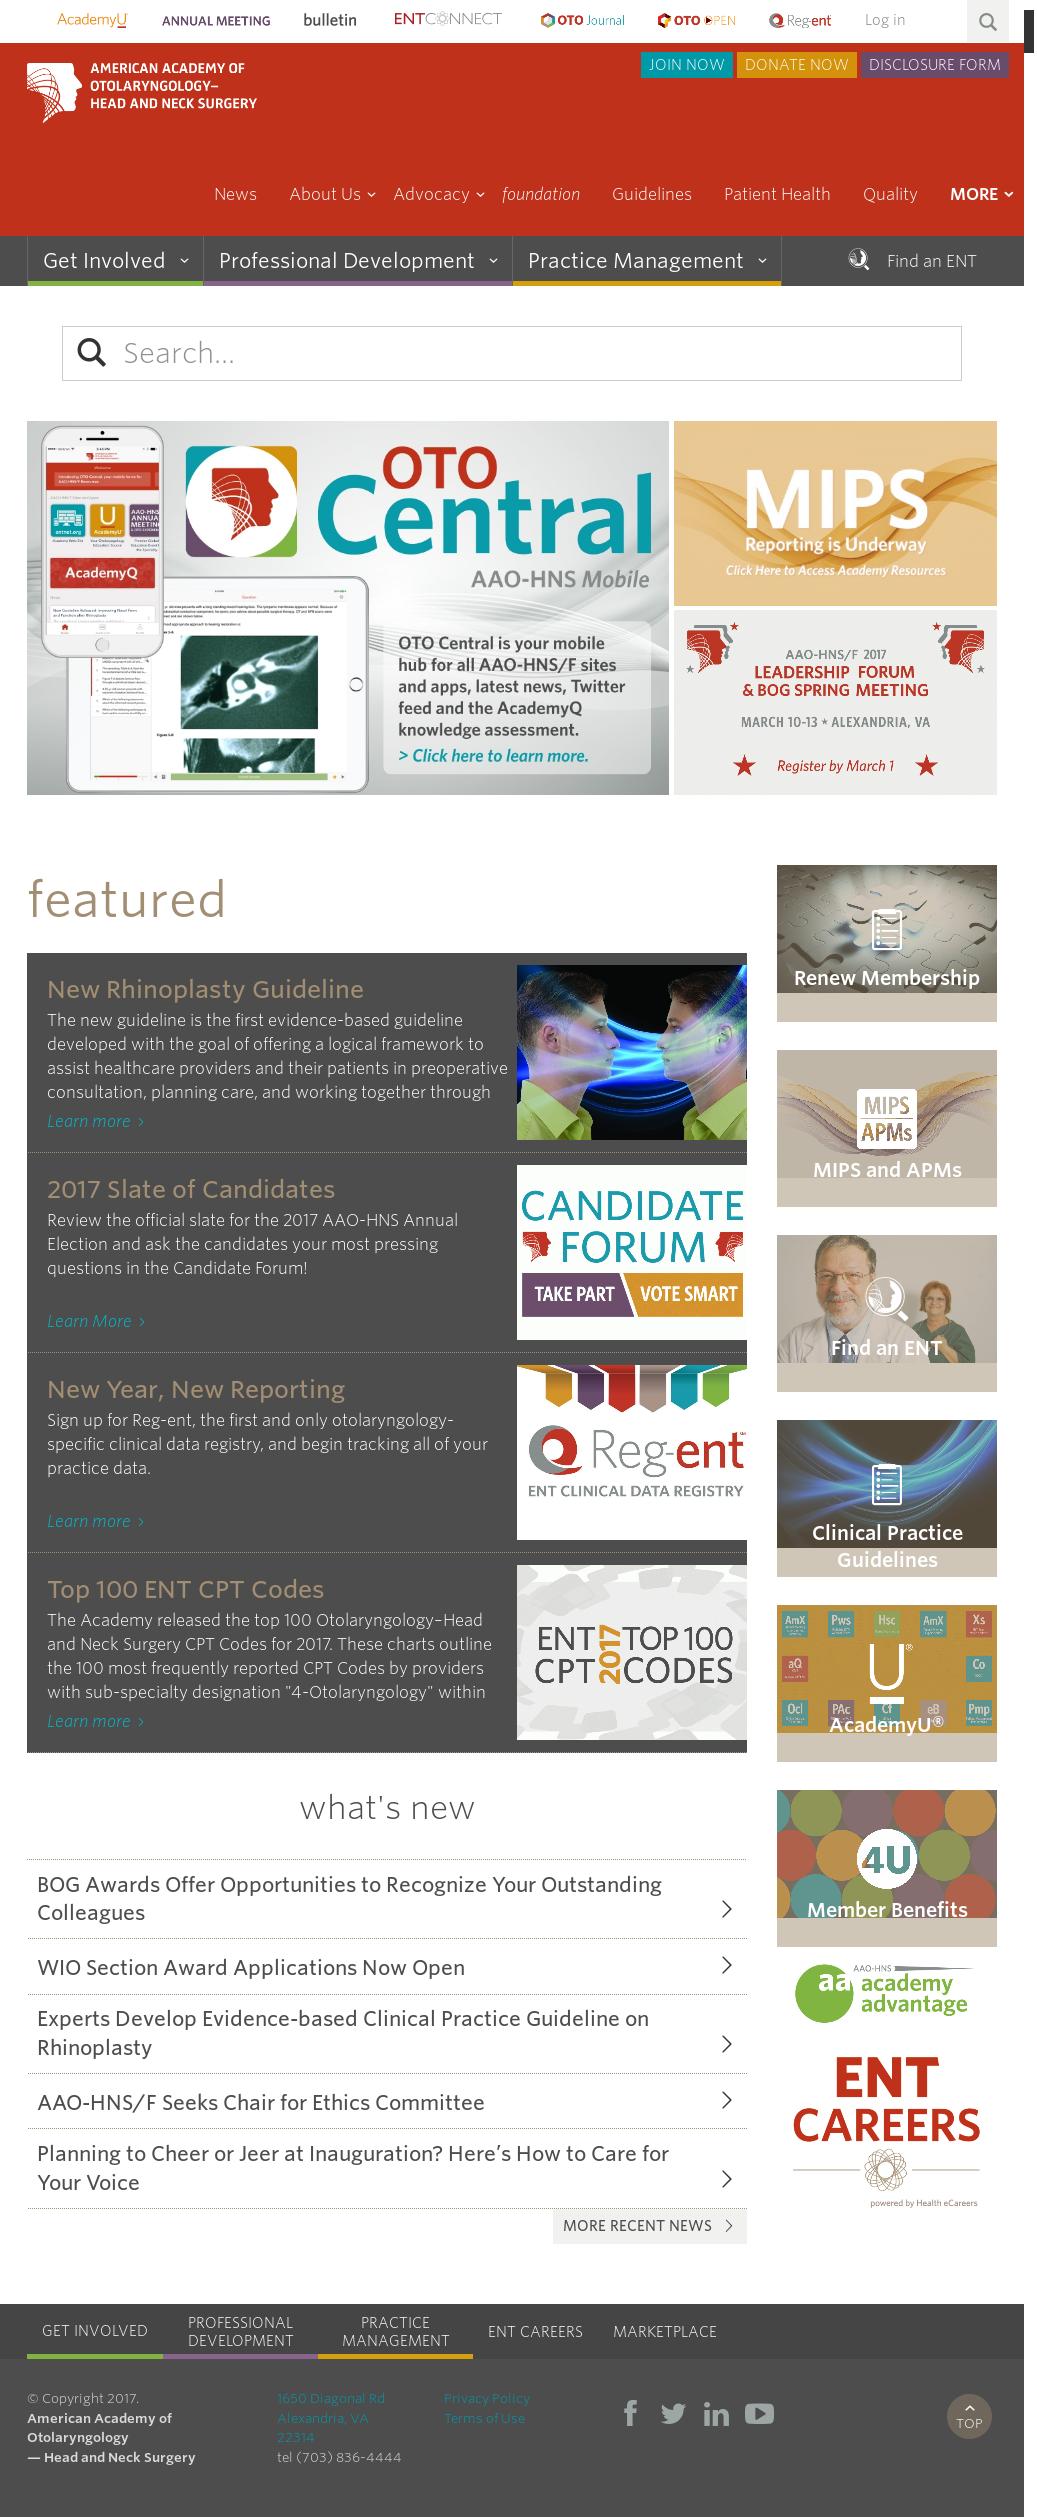 American Academy of Otolaryngology 's Latest News, Blogs